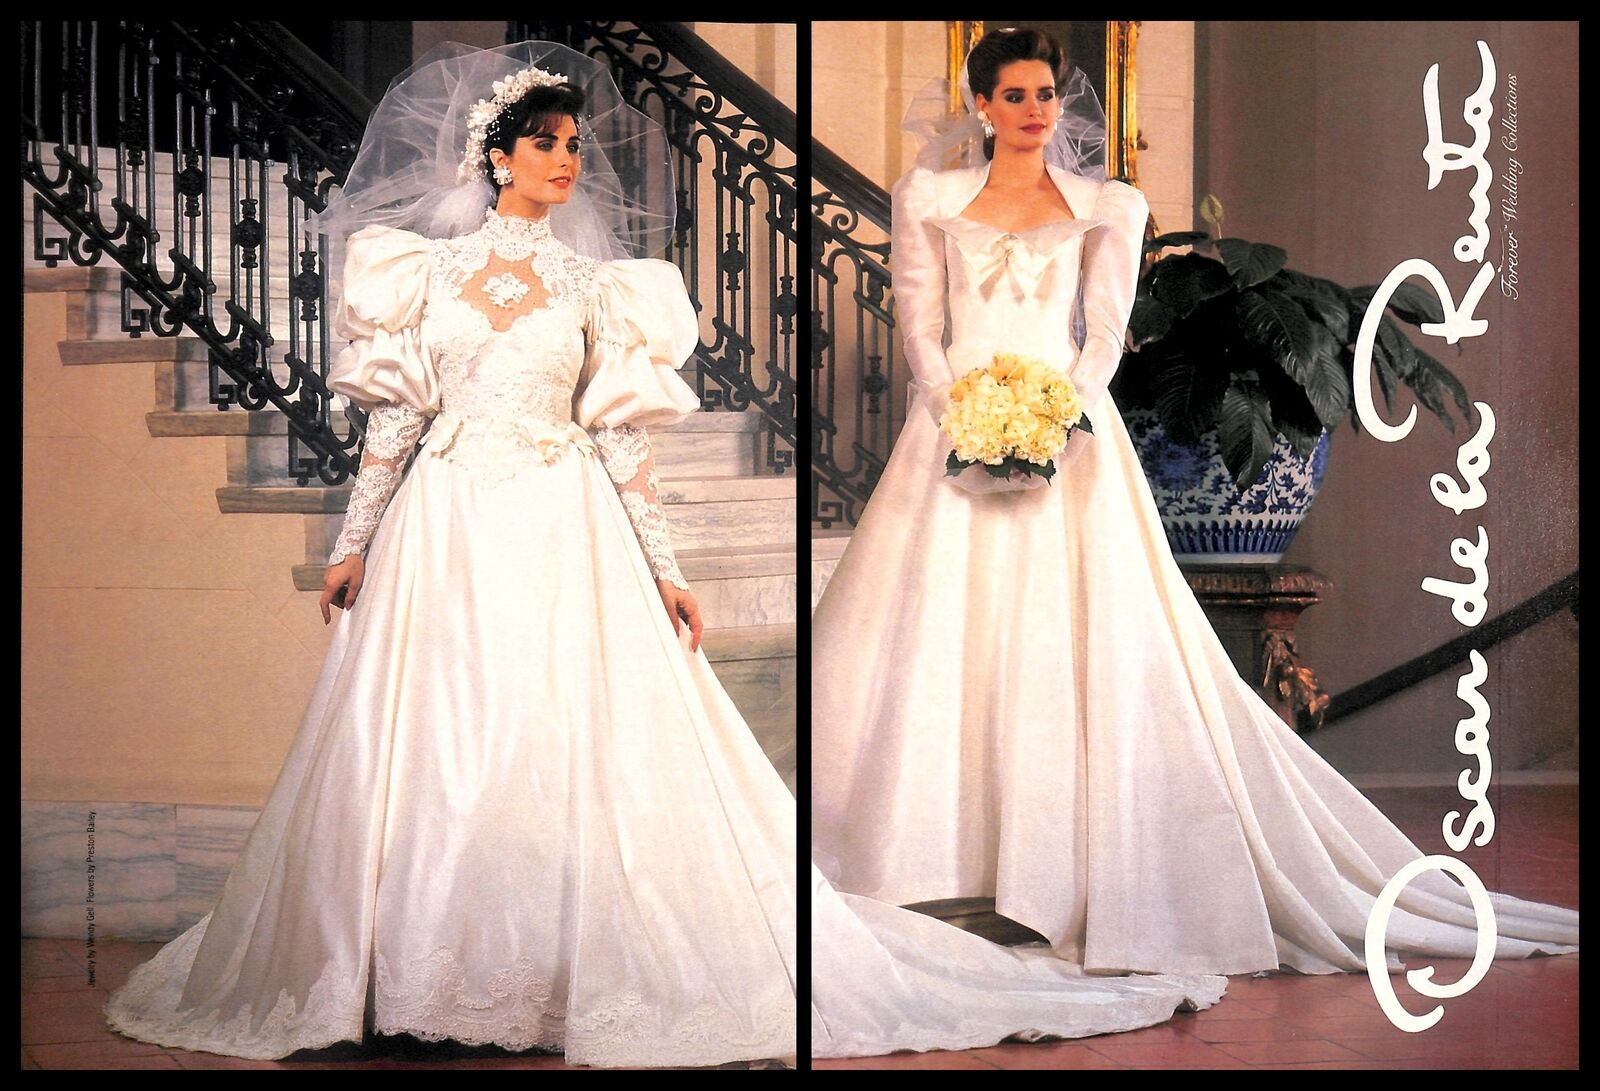 Oscar De La Renta Wedding Dresses.Details About 1987 Oscar De La Renta Wedding Dress Vintage Print Ad Marriage Bride Newlywed